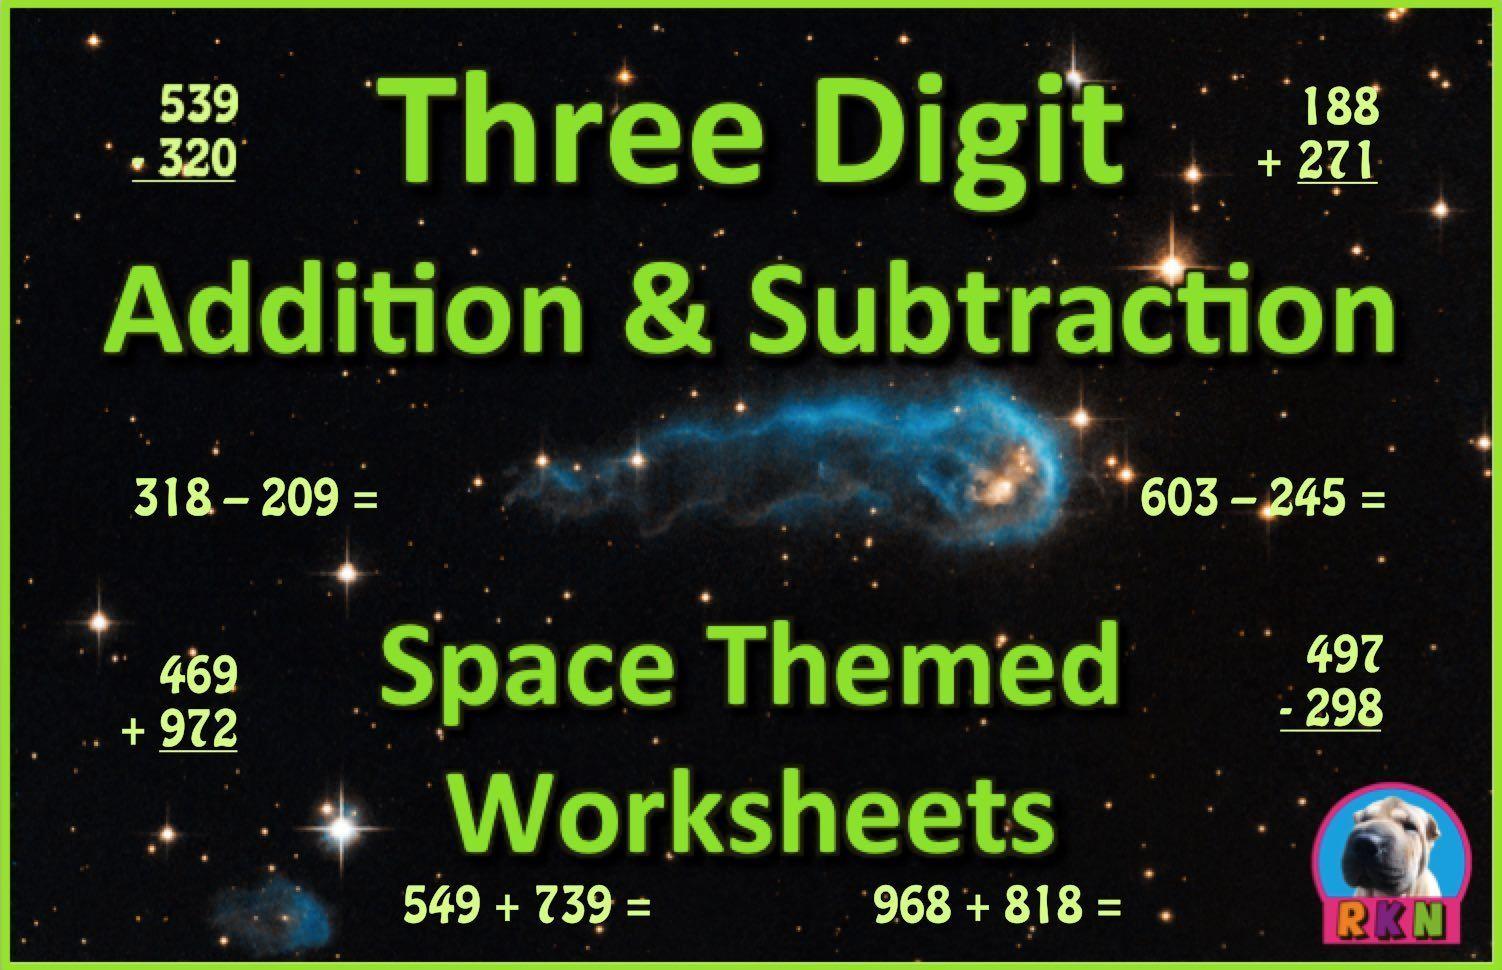 Three Digit Addition And Subtraction Worksheet Bundle